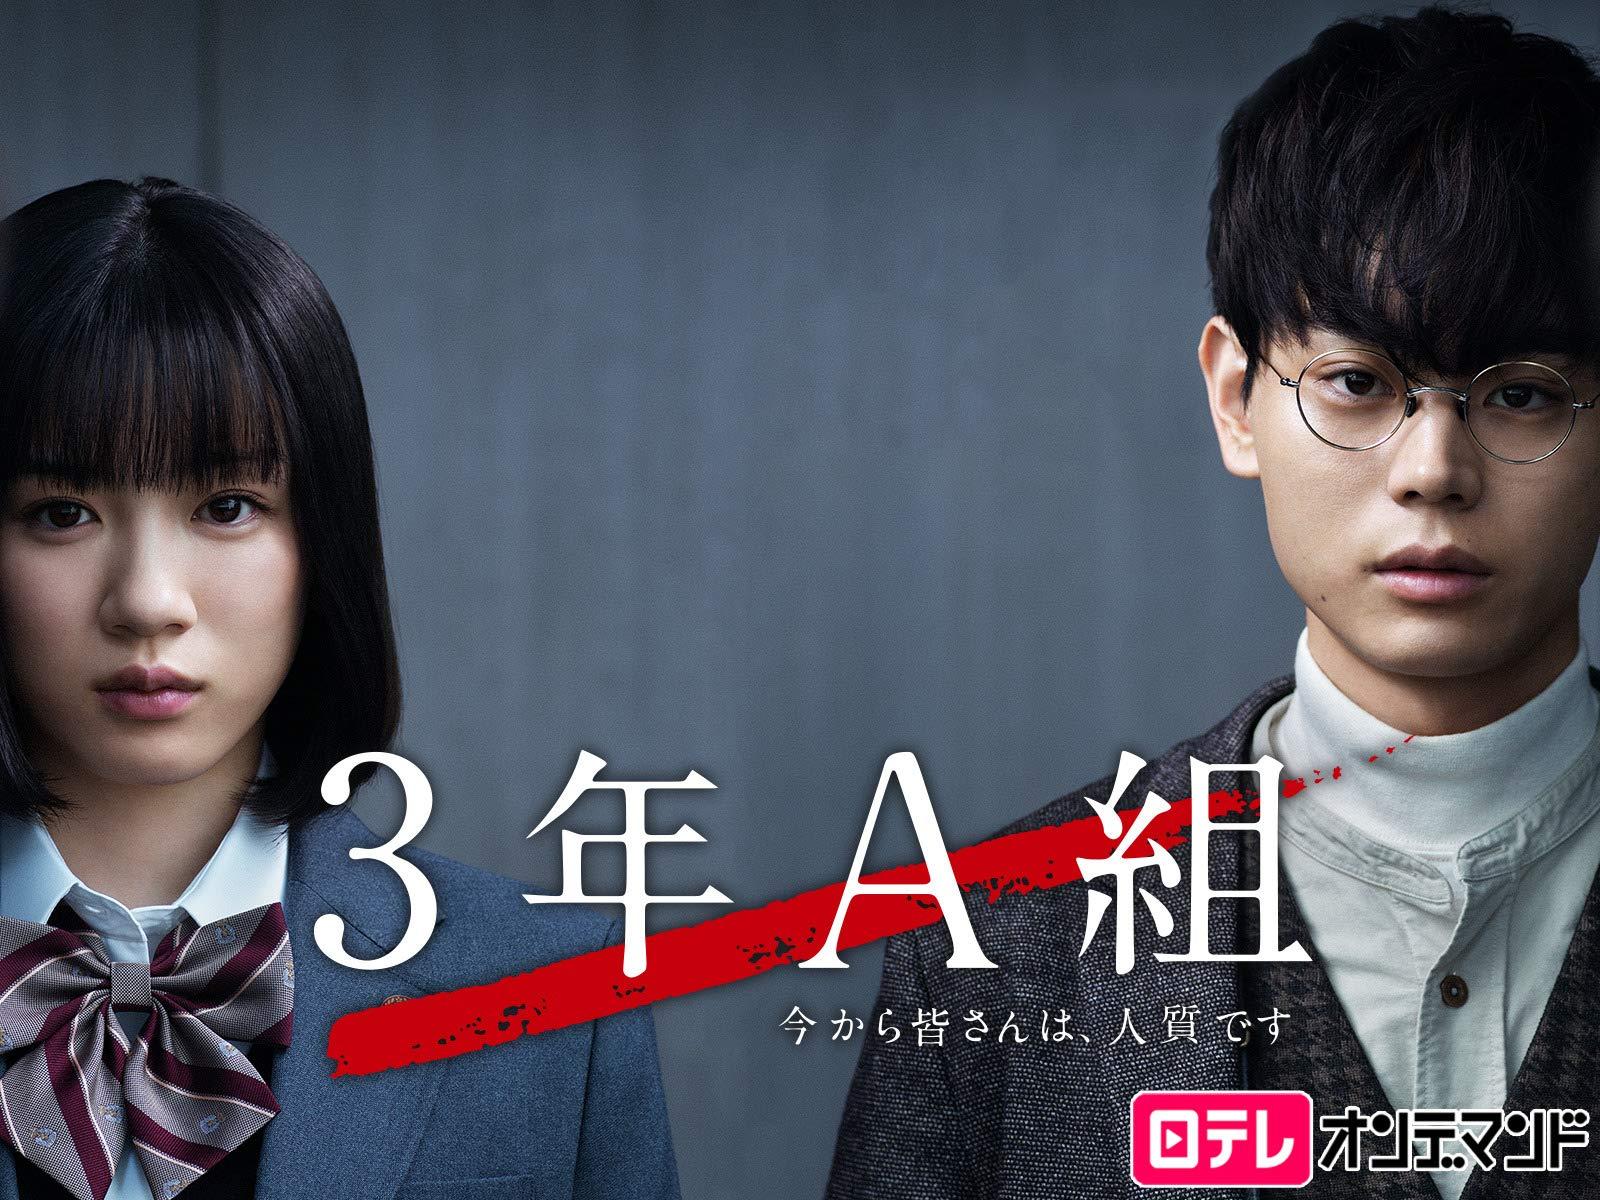 Amazon.co.jp: 3年A組-今から皆さんは、人質です-を観る | Prime Video